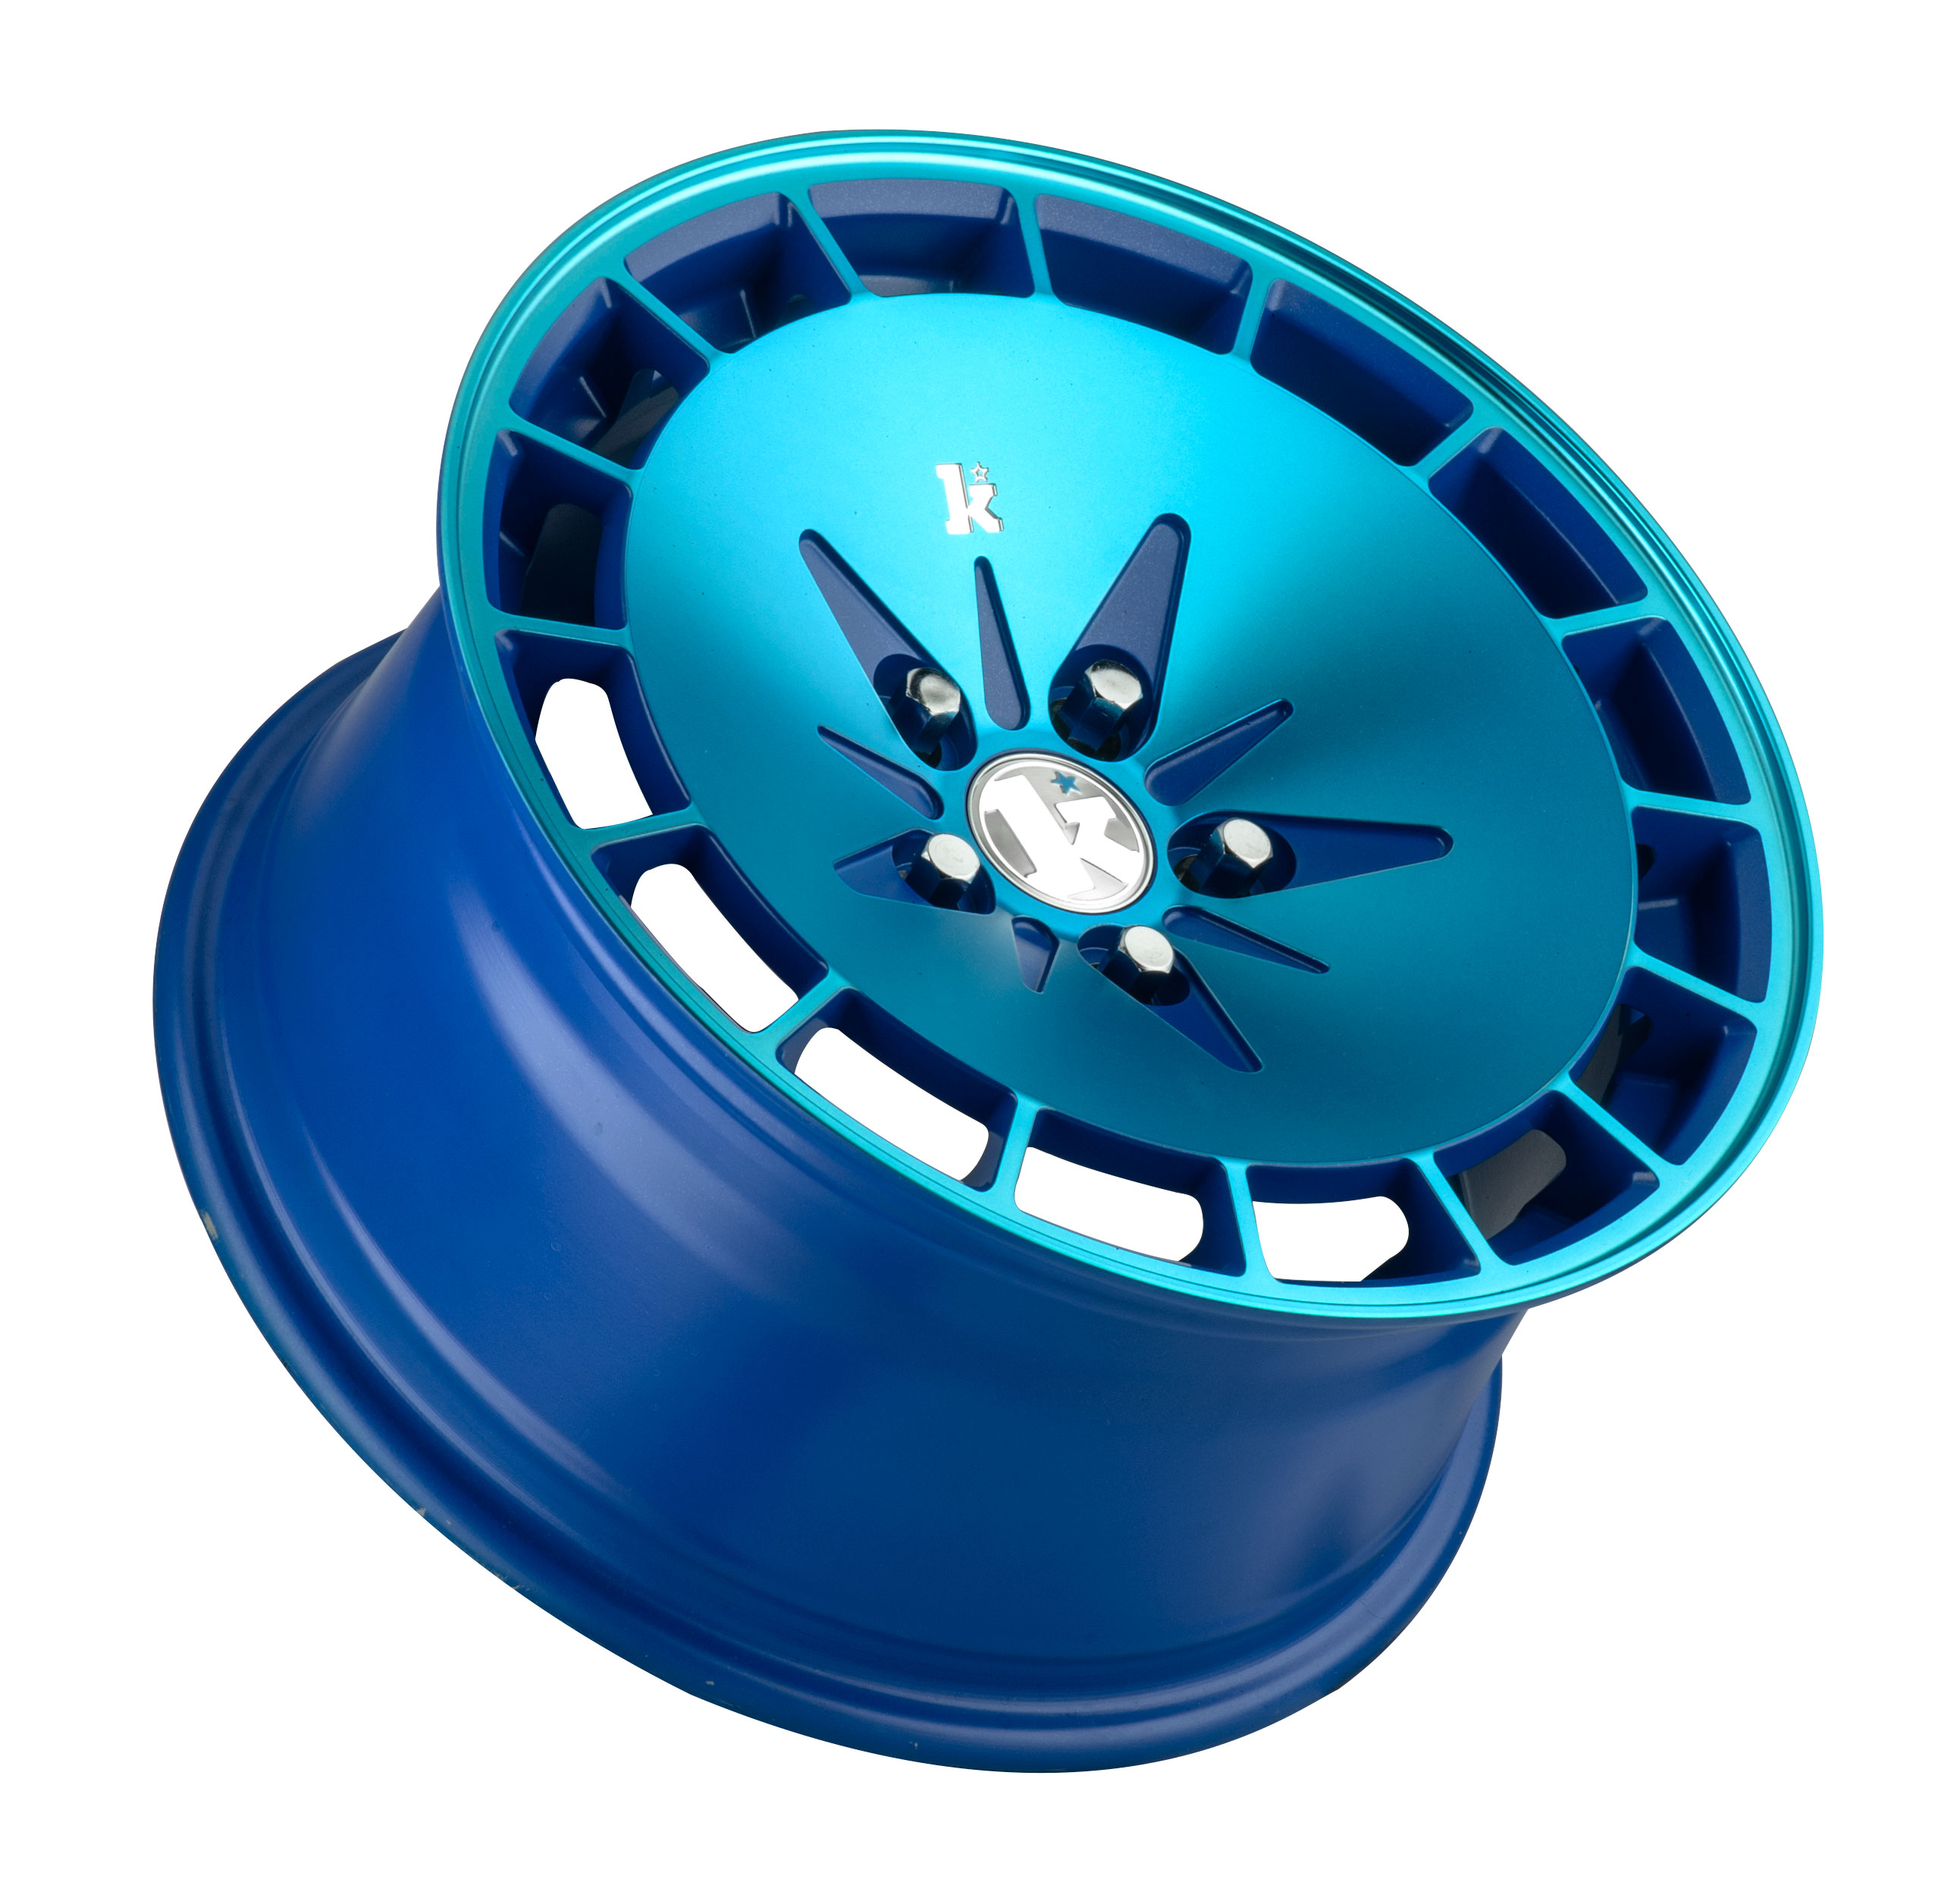 "15"" KLUTCH KM16 Wheels - Blue - VW / Audi - 4x100"